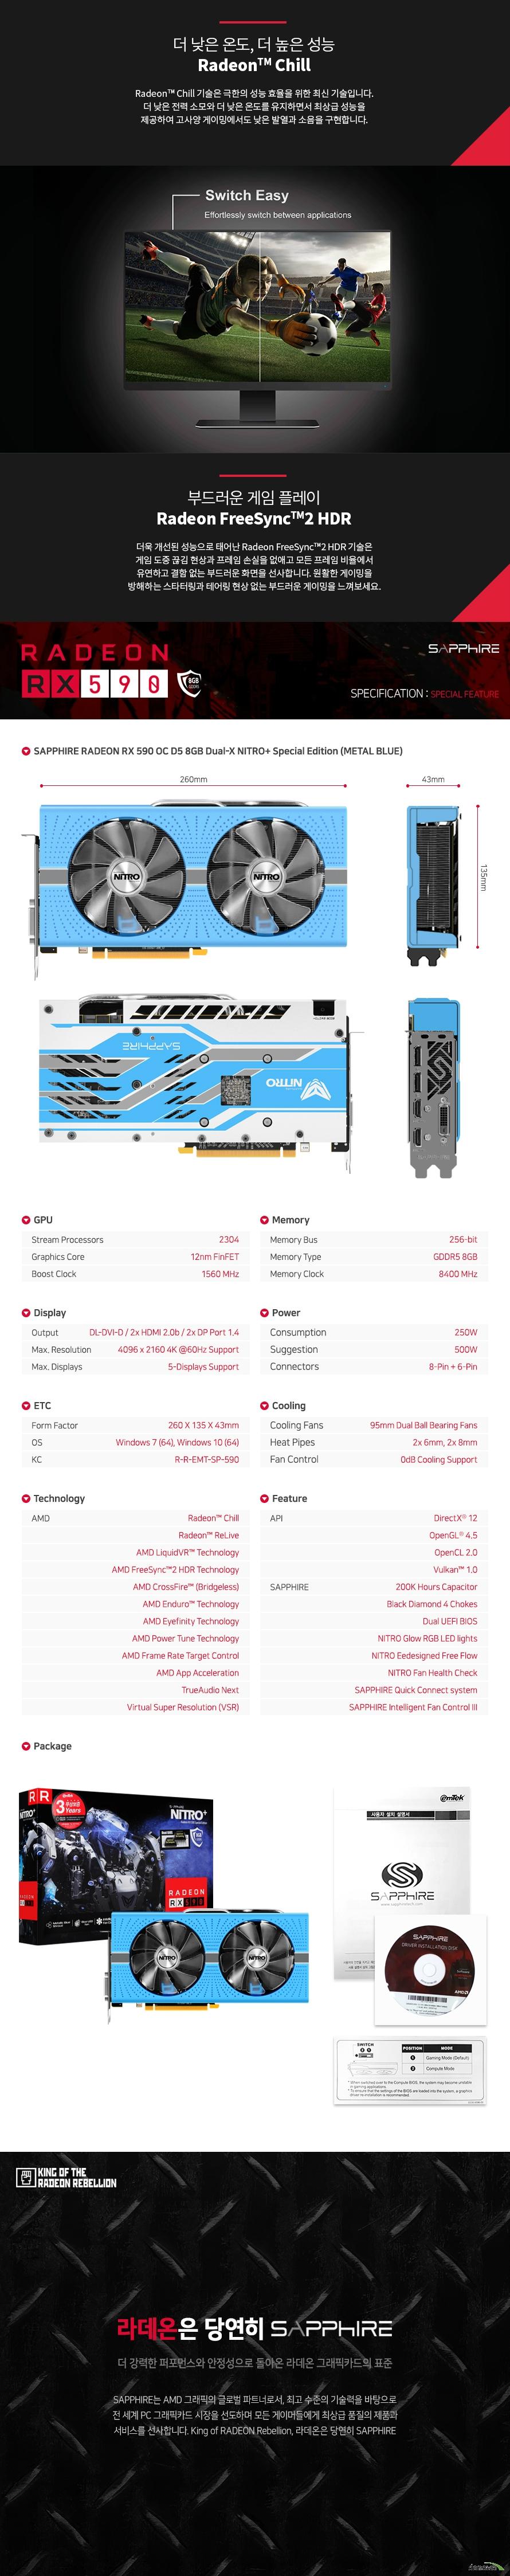 SAPPHIRE  라데온 RX 590 NITRO+ Special Edition OC D5 8GB Dual-X